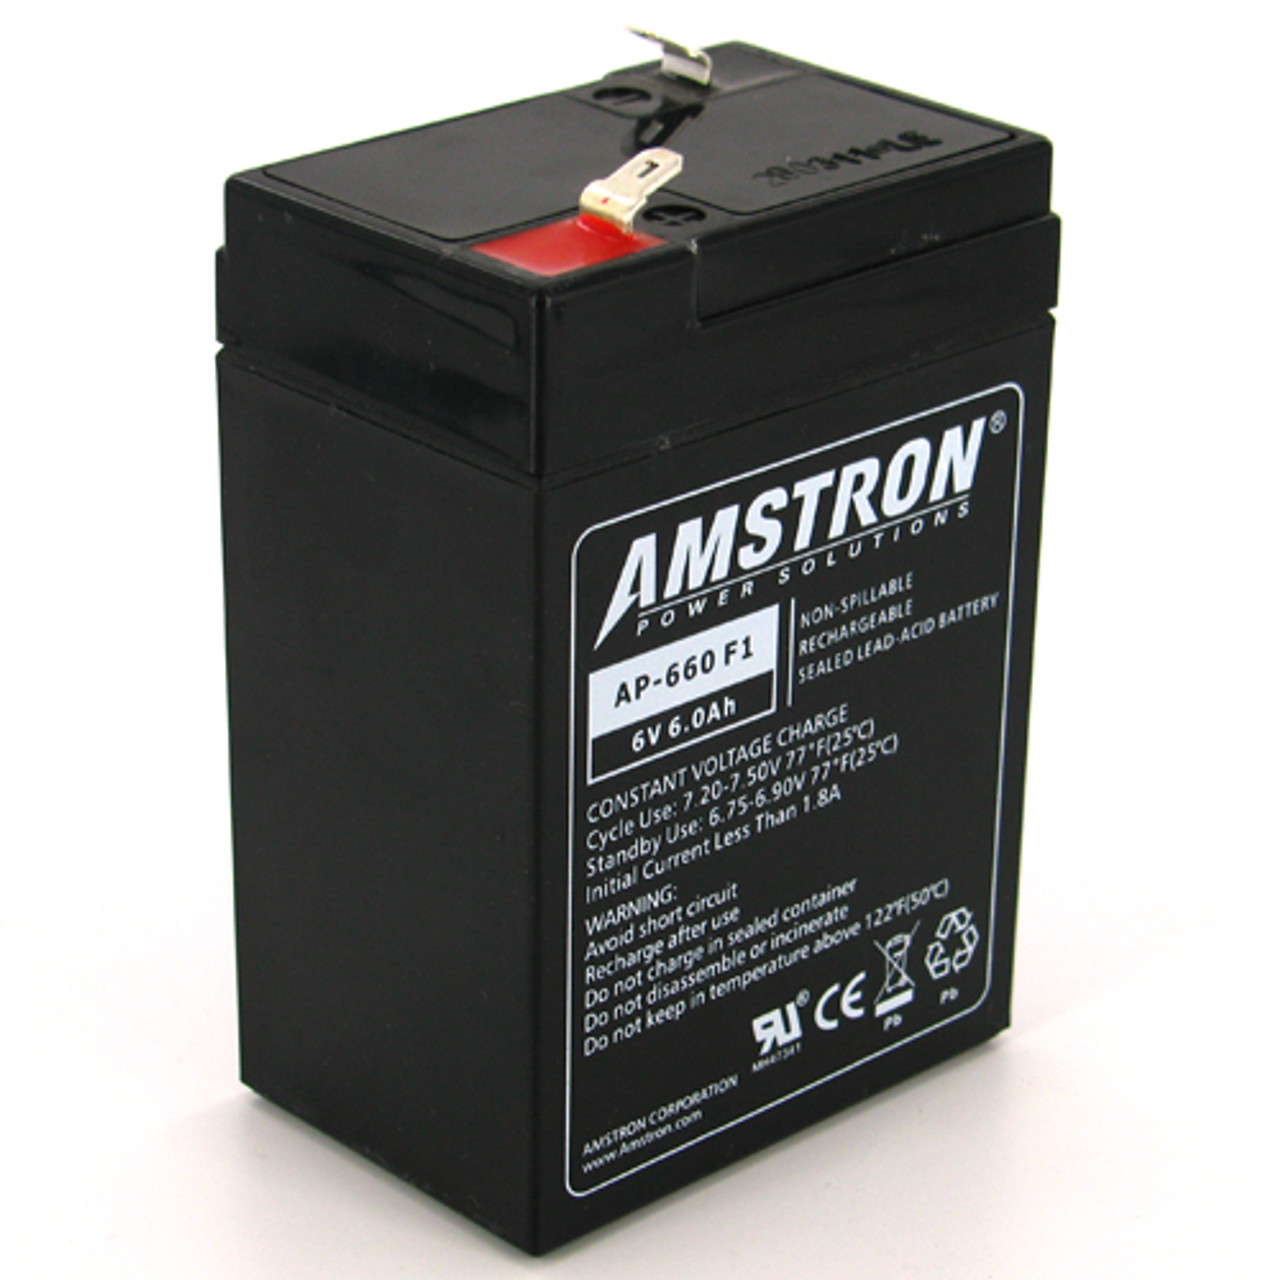 Casil CA640 6v 4ah UPS Battery for Lithonia ELB06042